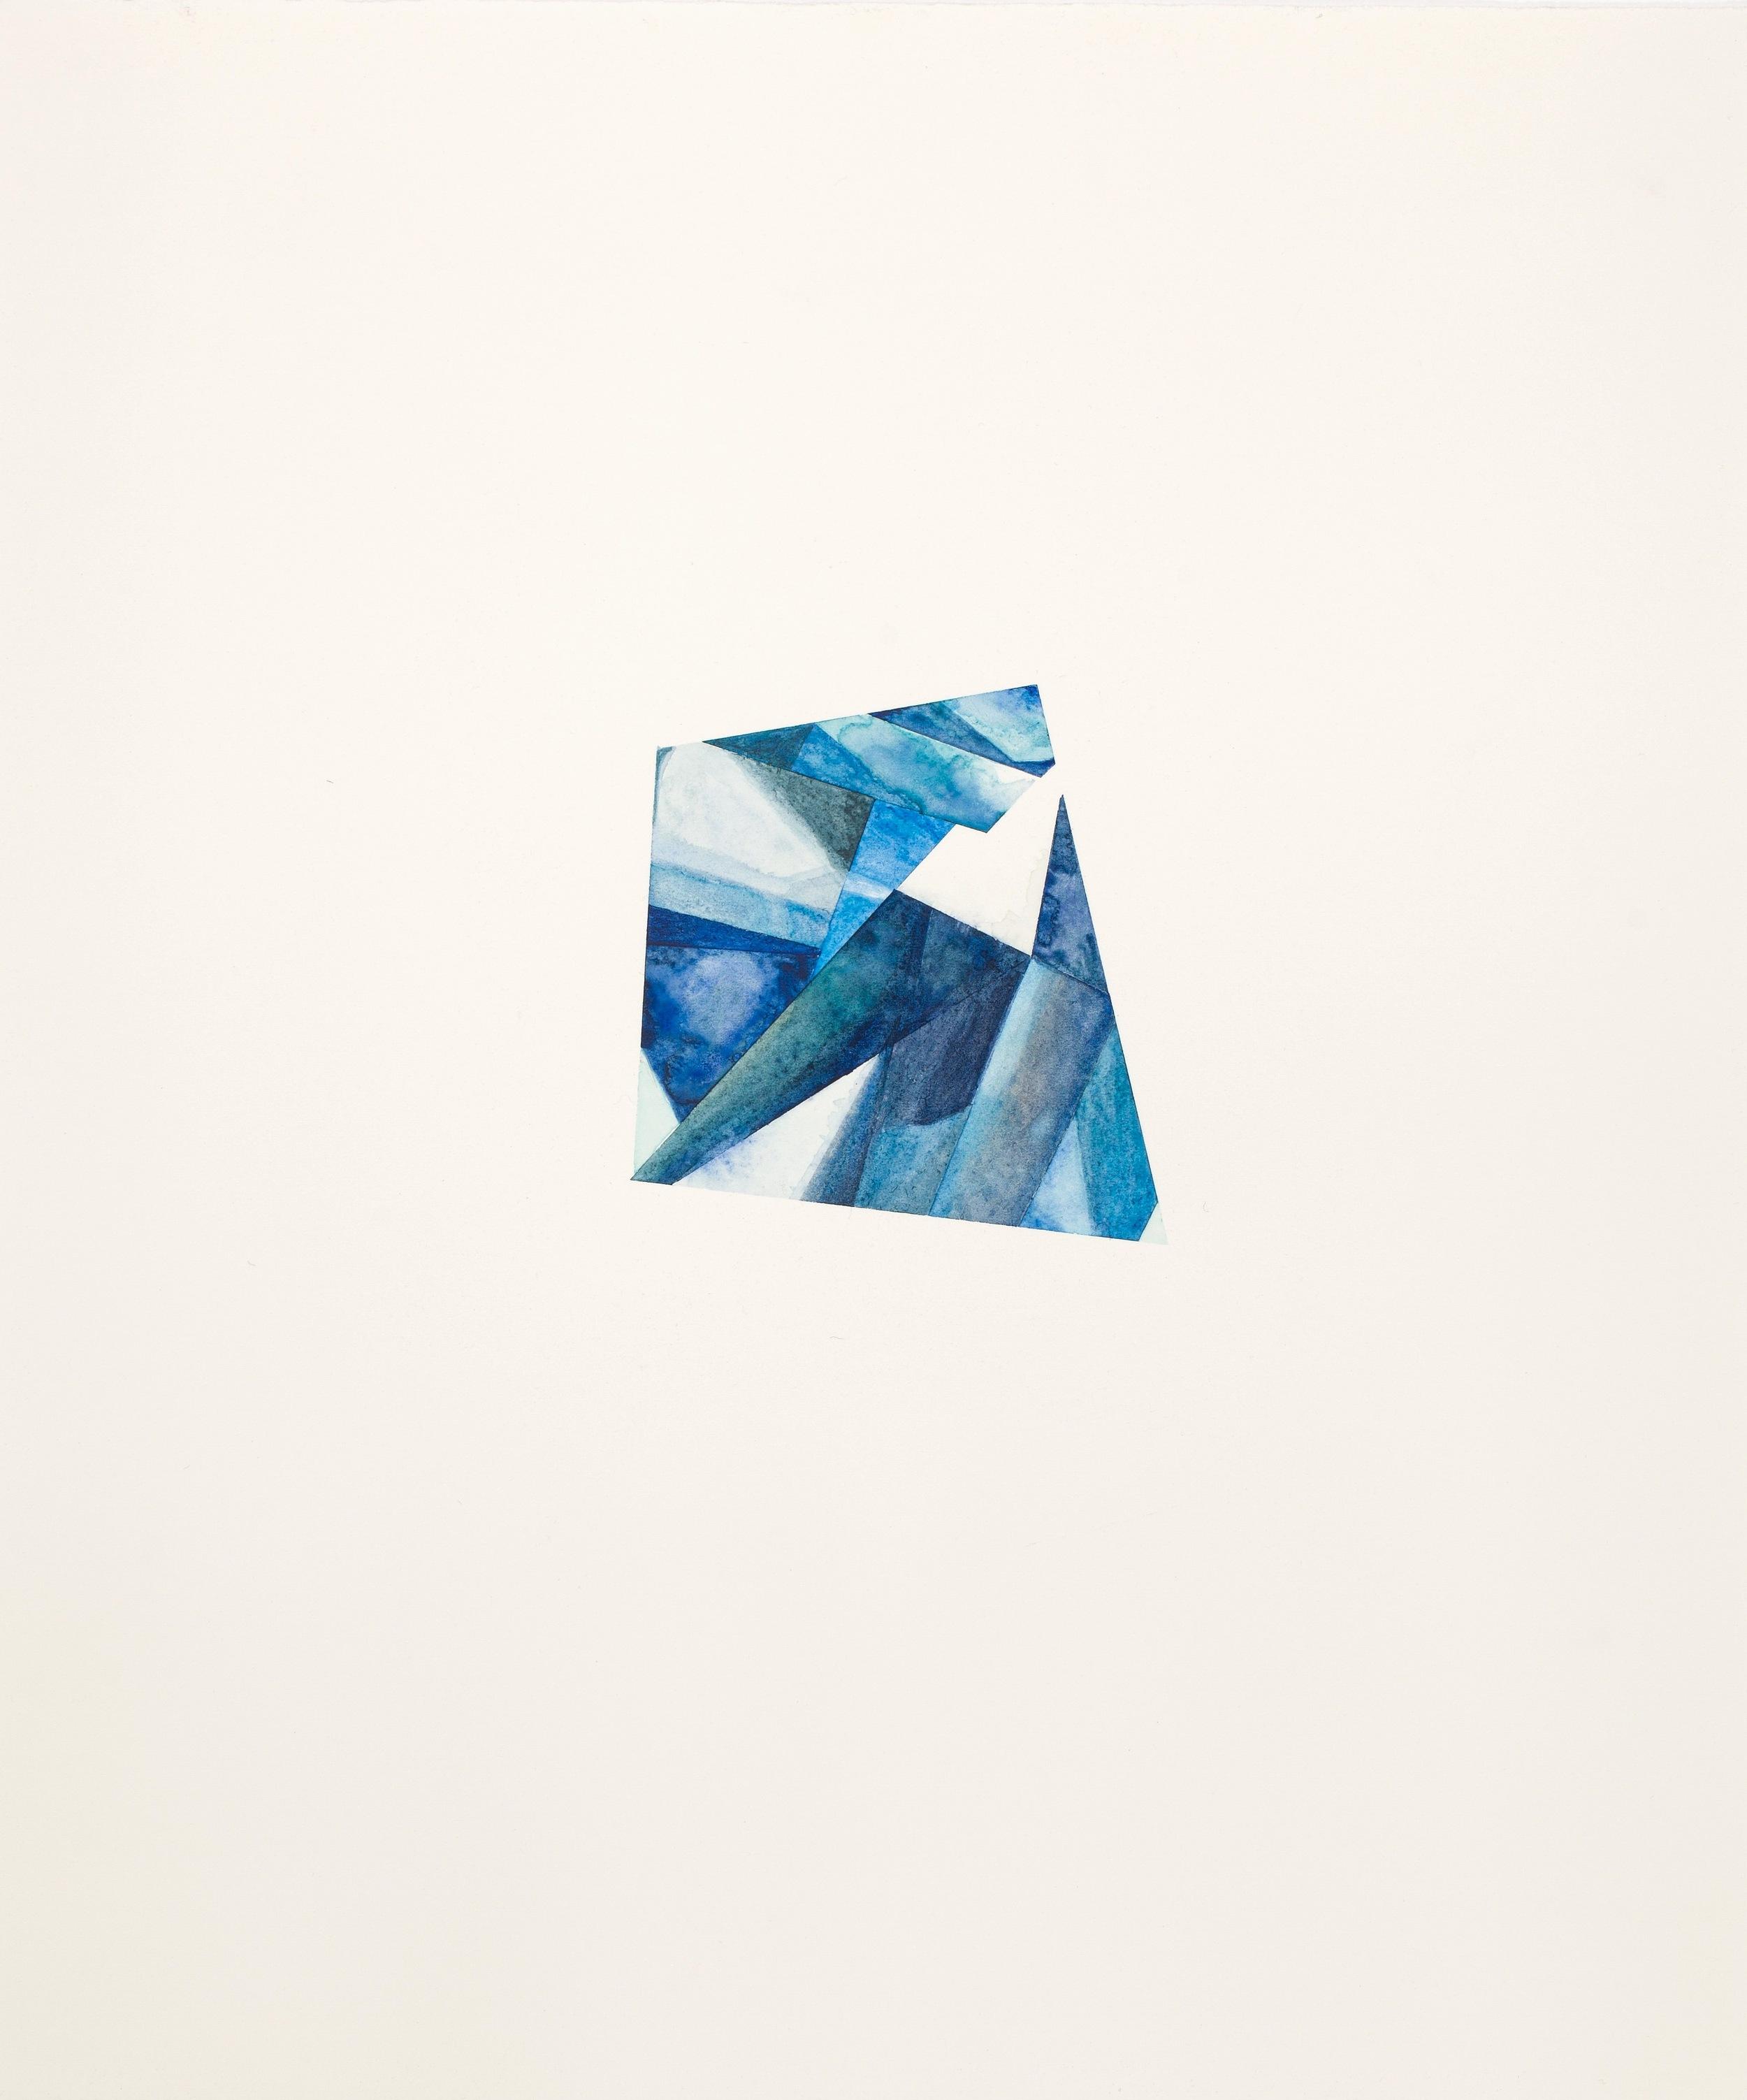 BlueFacet_sm.jpg